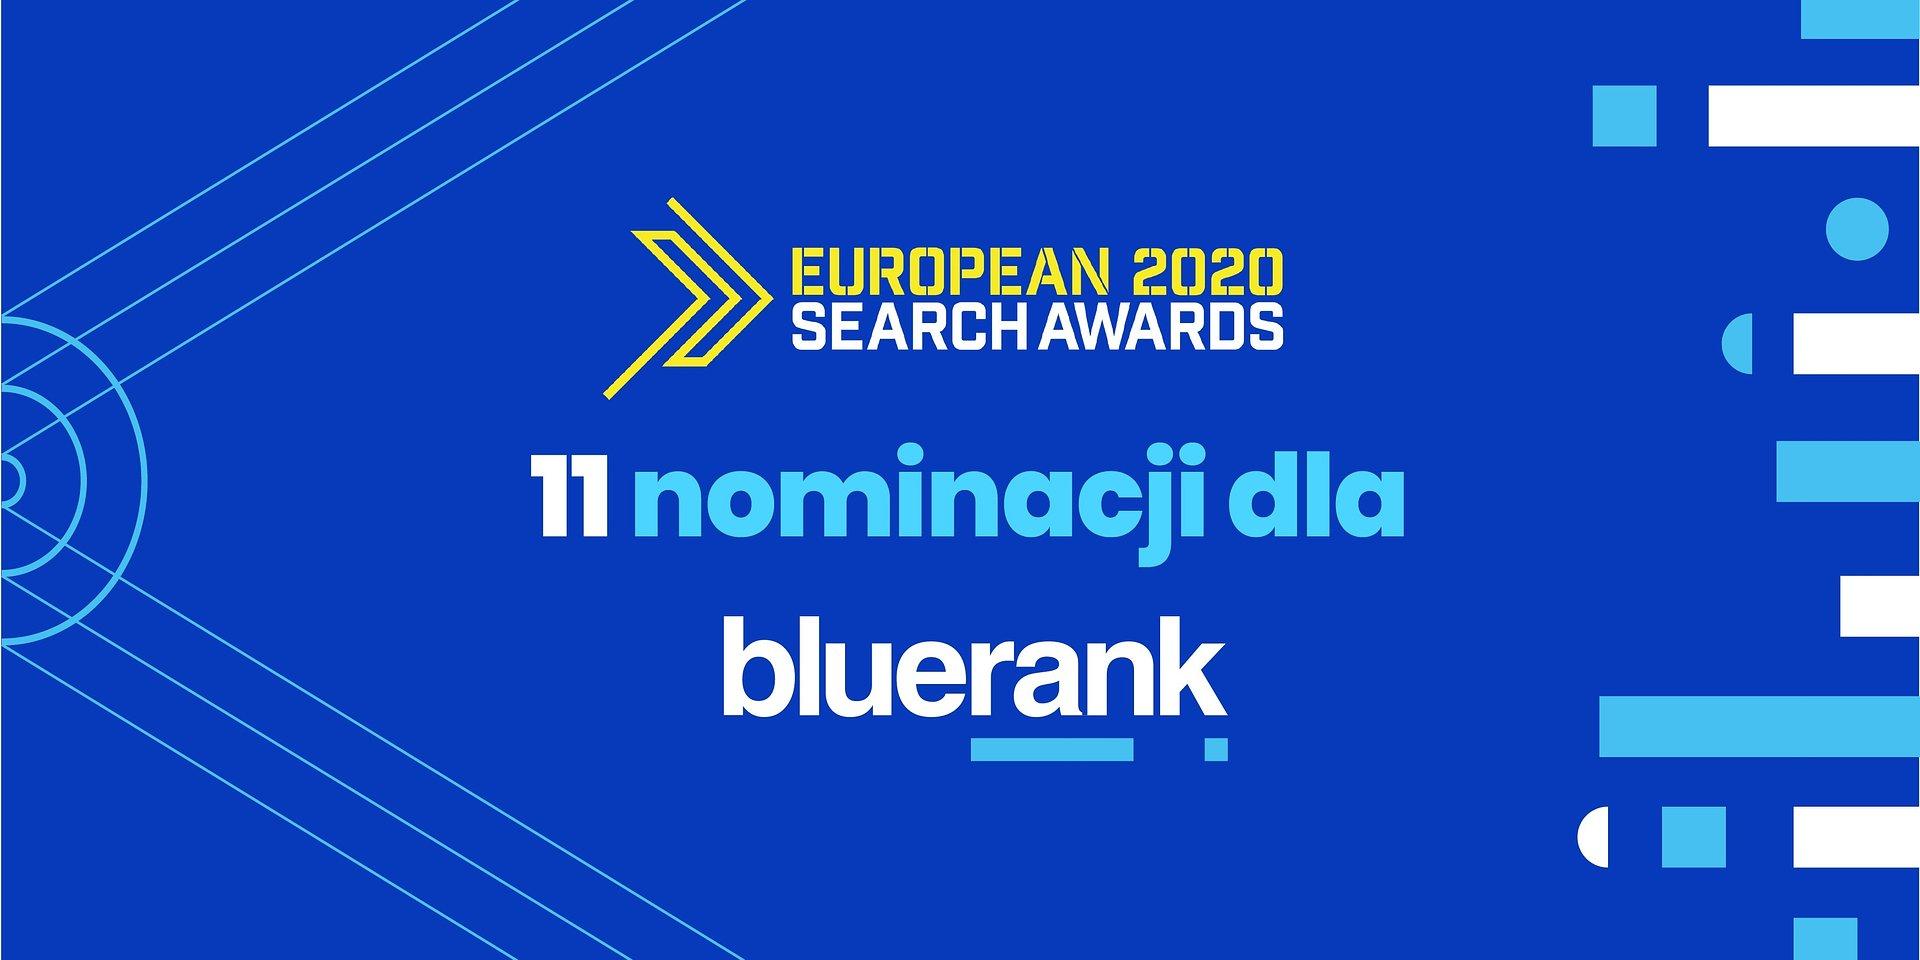 11 nominacji ESA dla Bluerank!